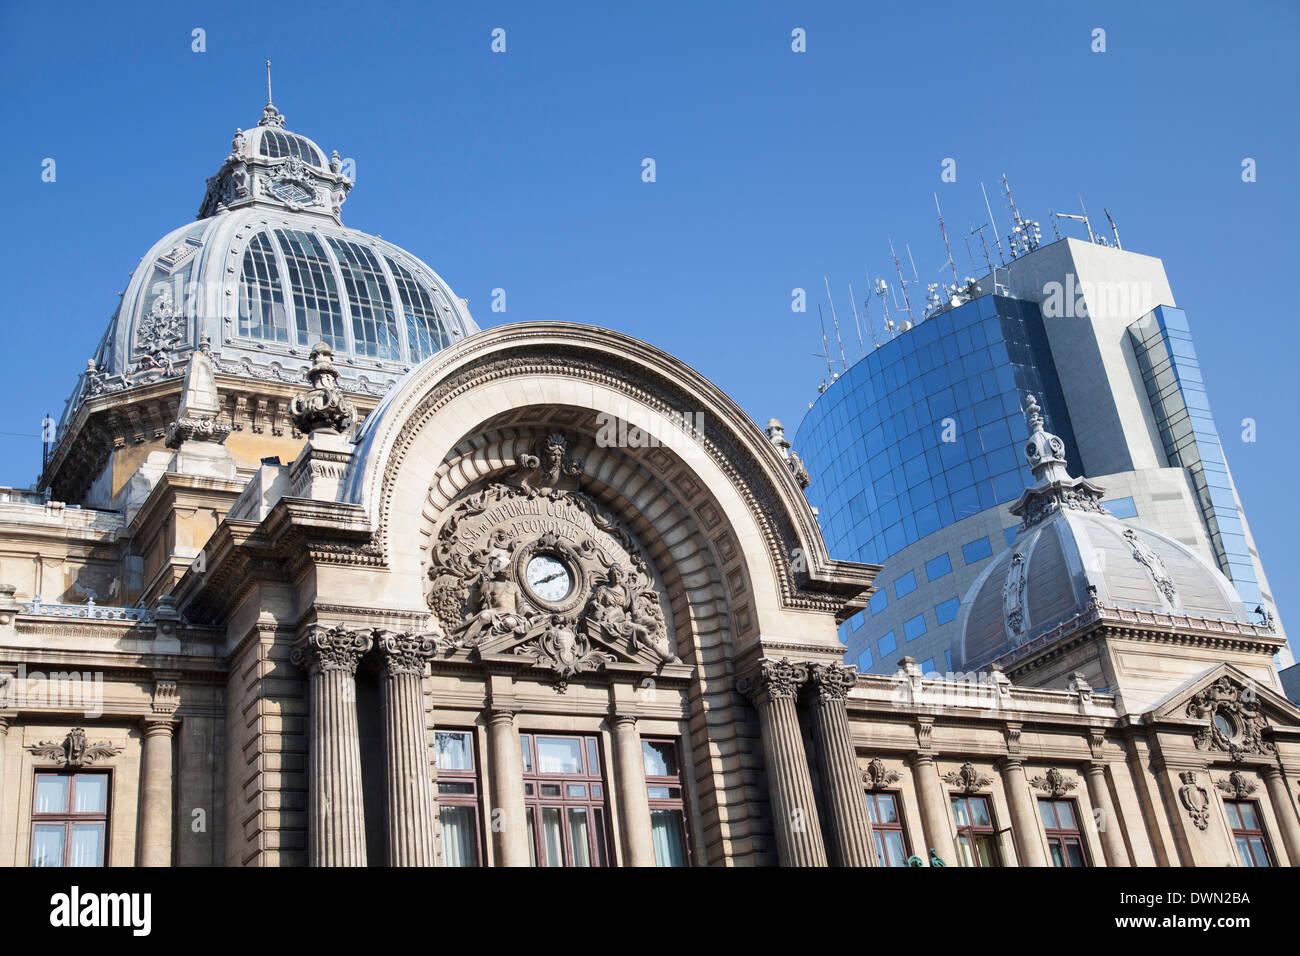 Economic Consortium Palace and Bucharest Financial Plaza, Historic Quarter, Bucharest, Romania, Europe - Stock Image